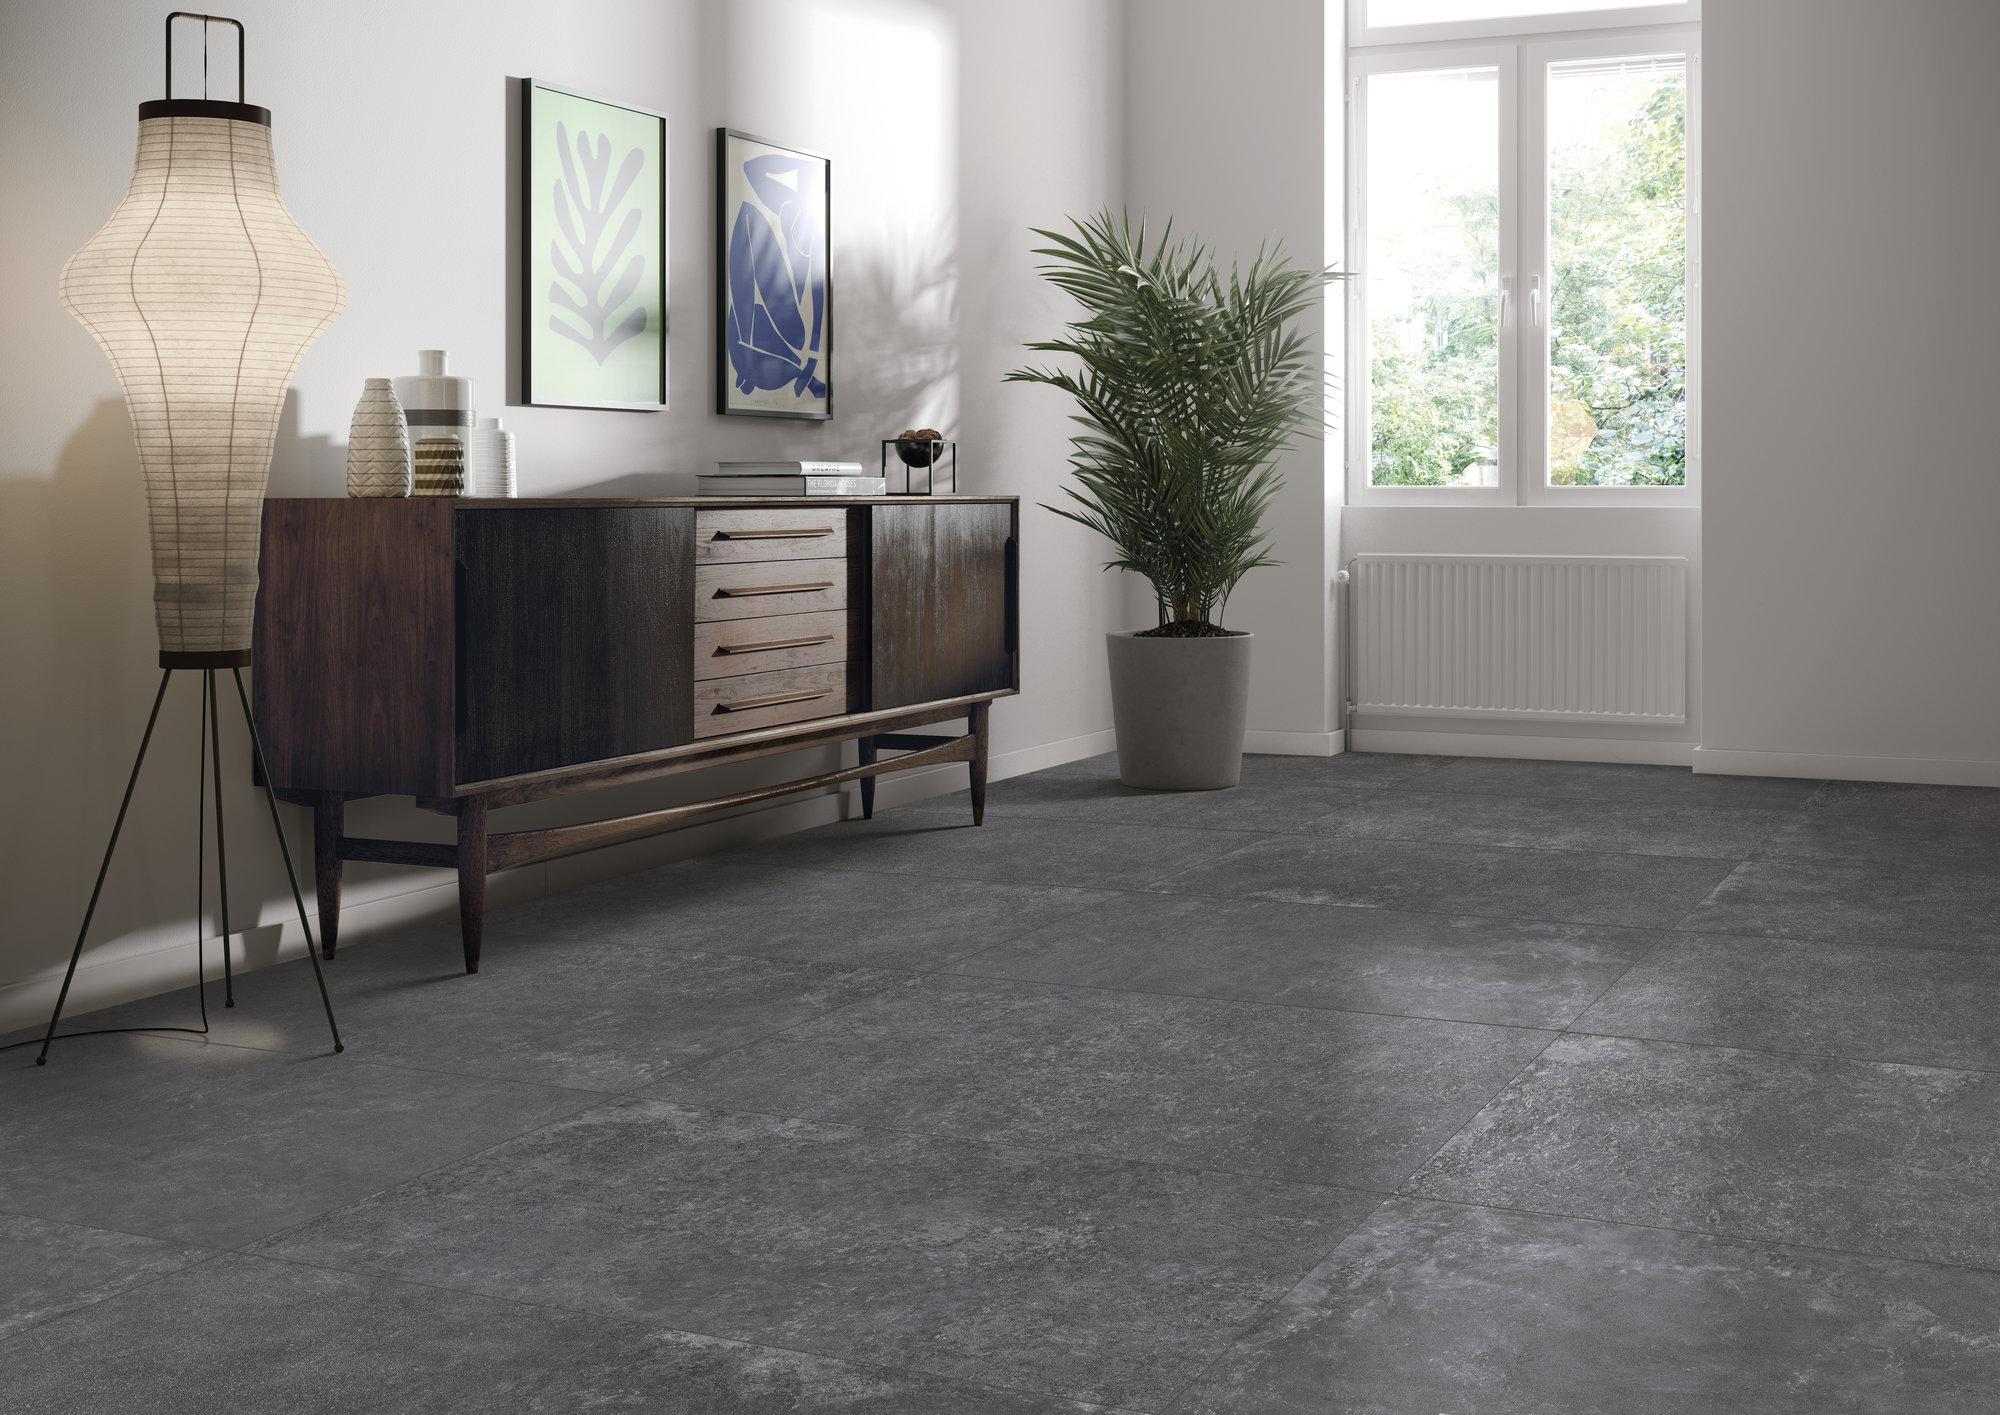 grunge floor peronda